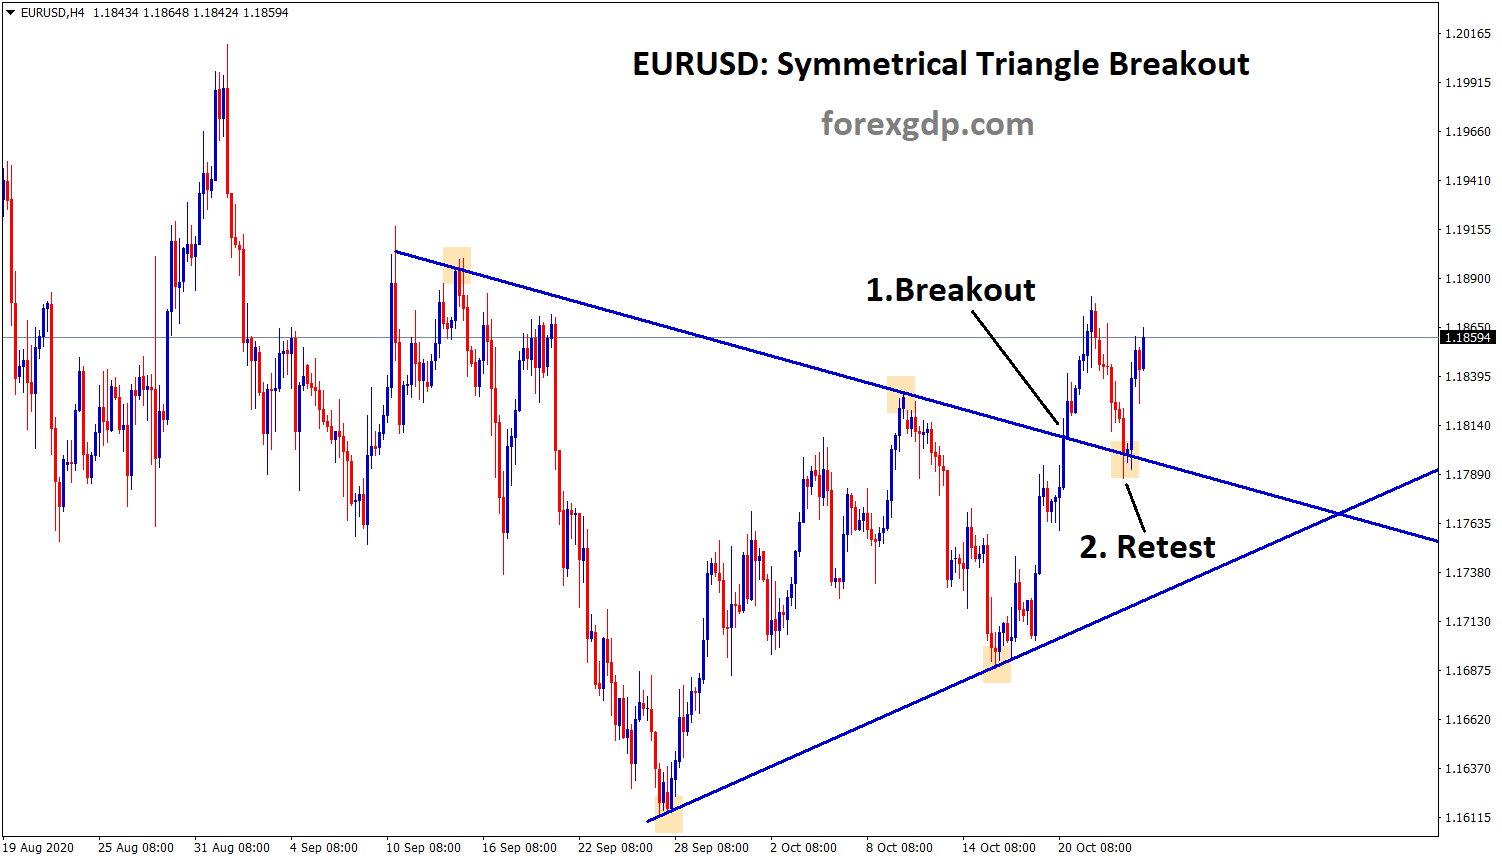 eurusd symmetrical triangle breakout and retest in eurusd